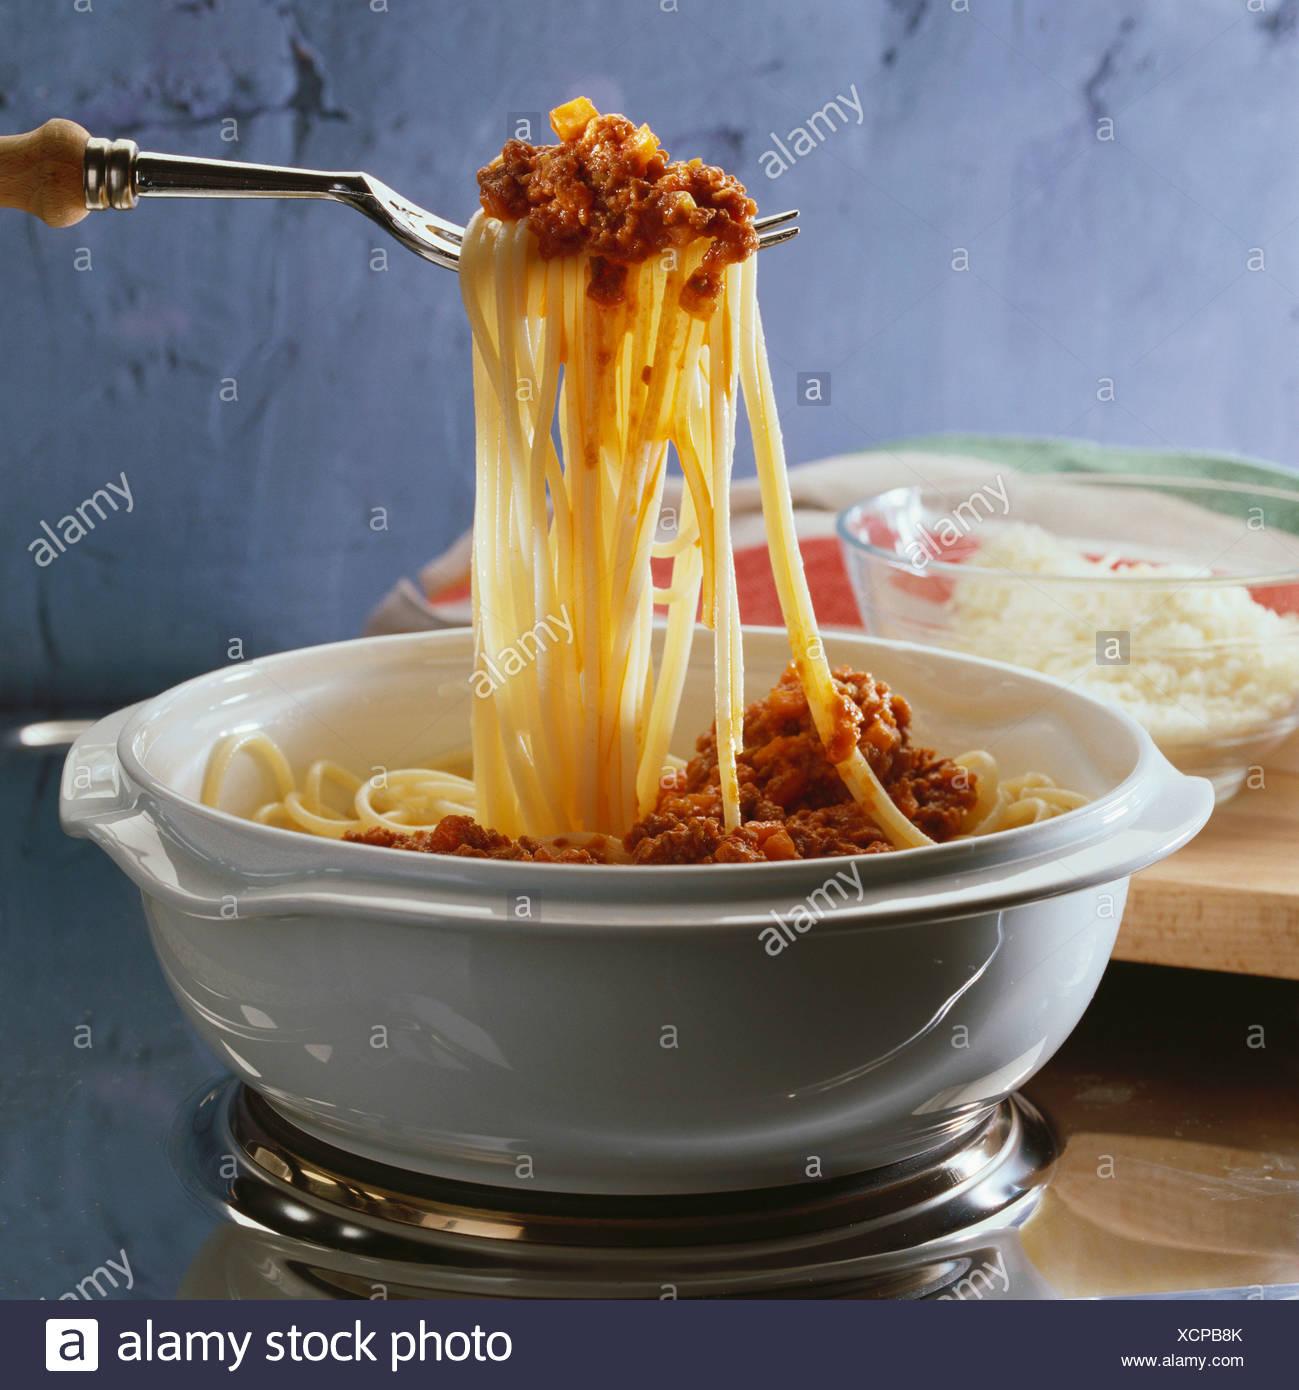 Spaghetti Alla Bolognese Spaghetti With Mince Sauce Stock Photo